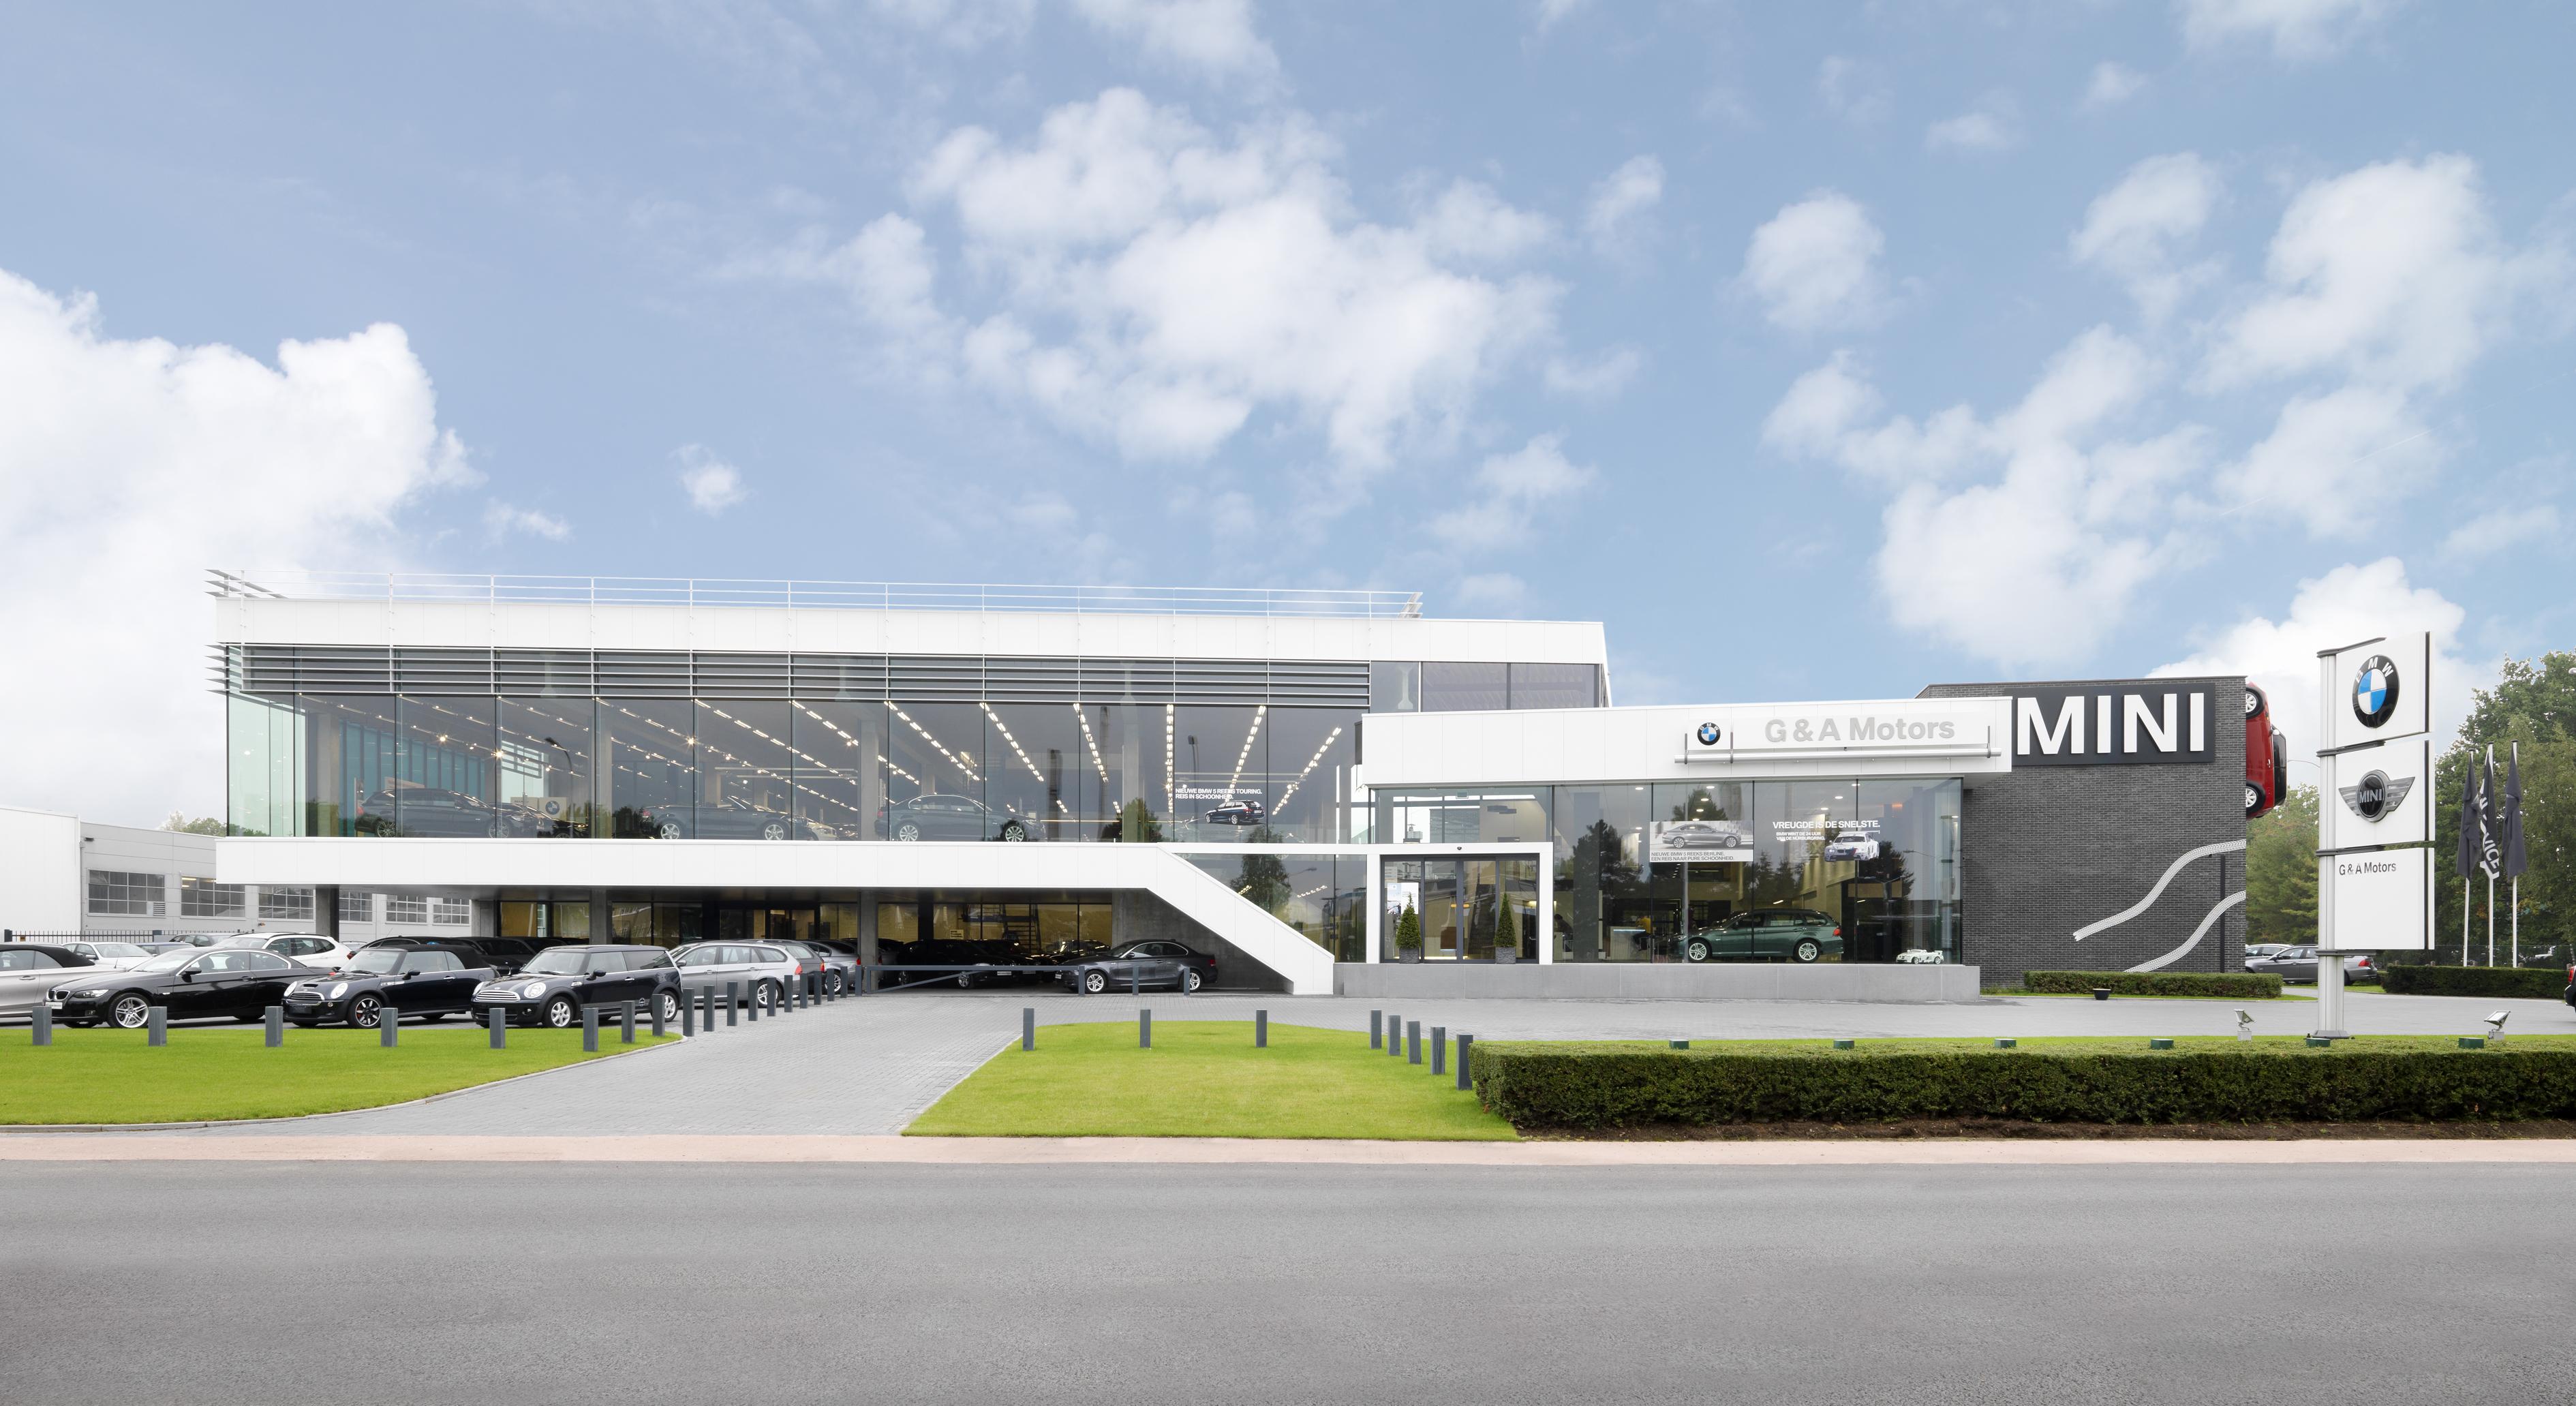 BMW: Arpeggio: G & A Motors nv, Raadsherenstraat 1, 2300 Turnhout: gevel